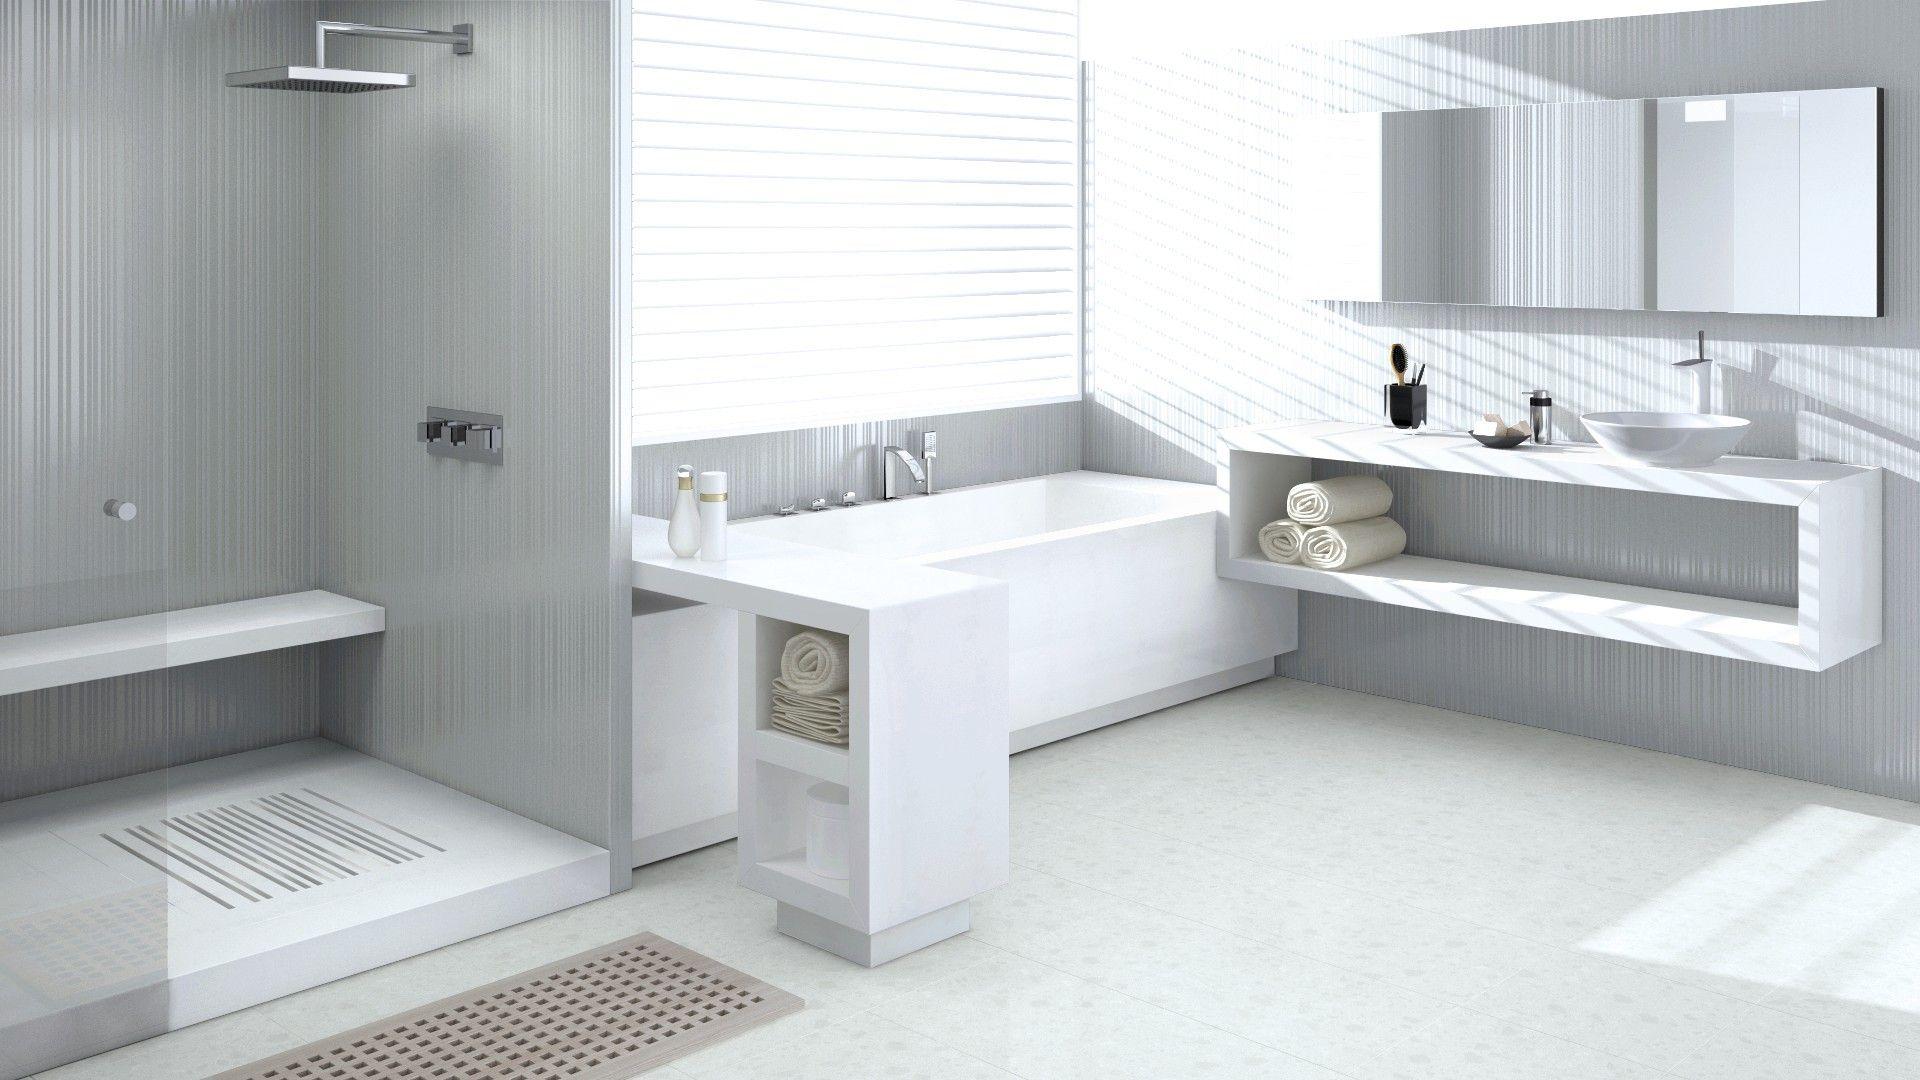 Pin by better home design on inspiration bathroom pinterest